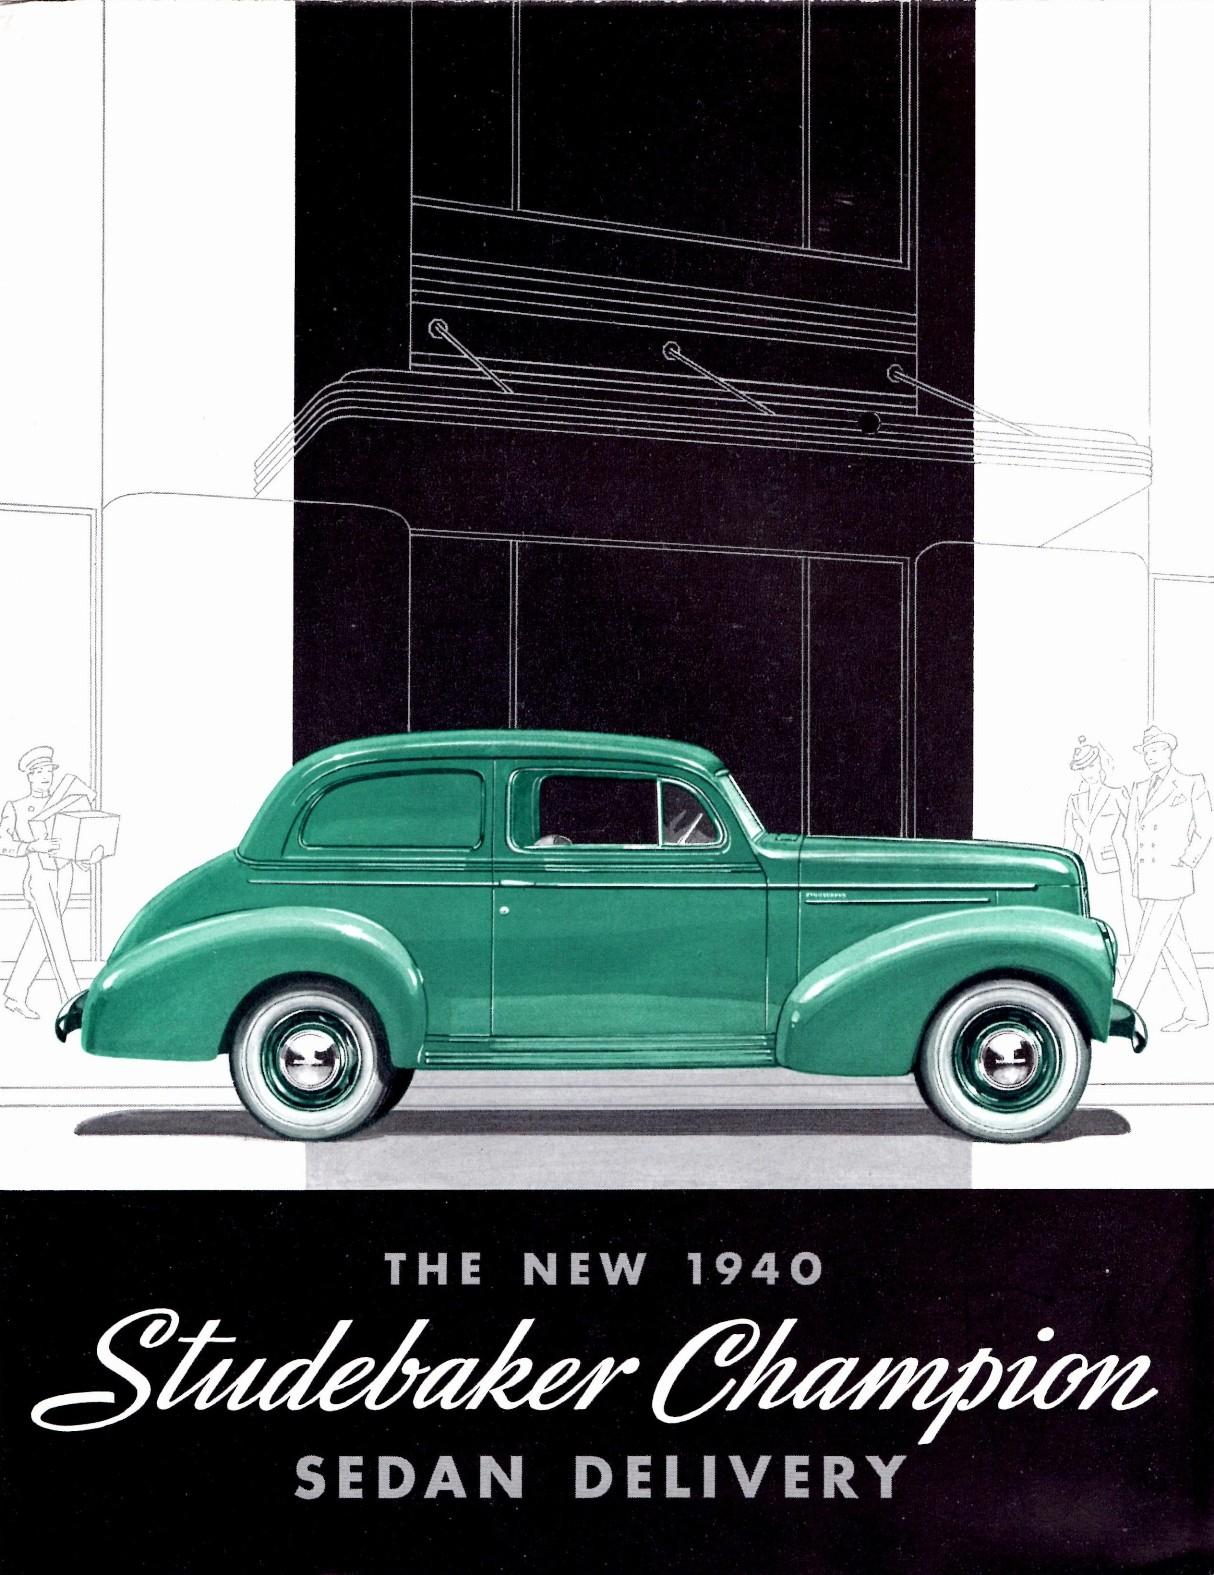 1940 Studebaker Champion Sedan Delivery   Alden Jewell   Flickr